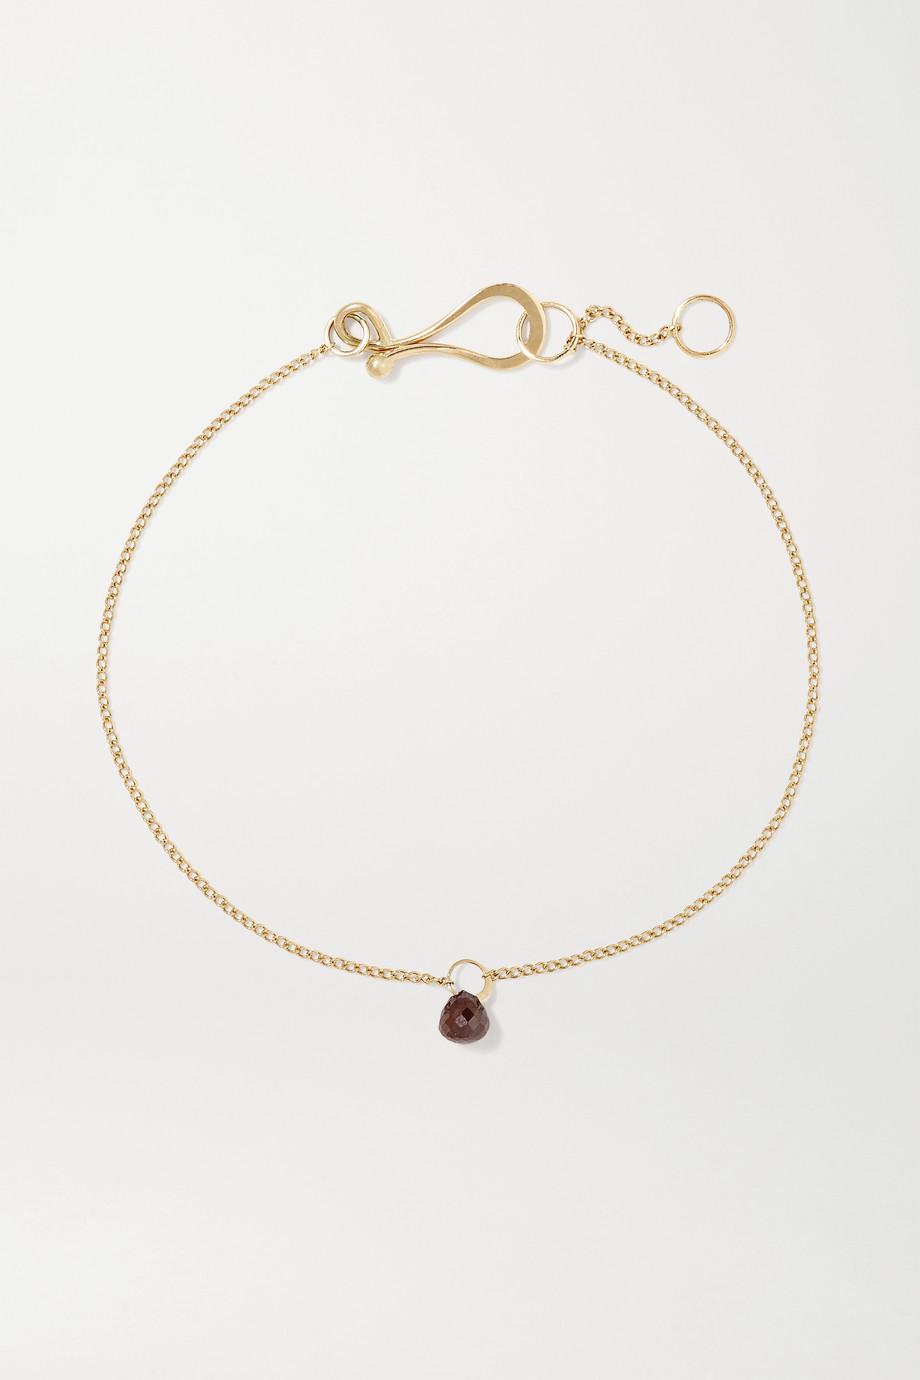 Melissa Joy Manning 14-karat gold diamond bracelet